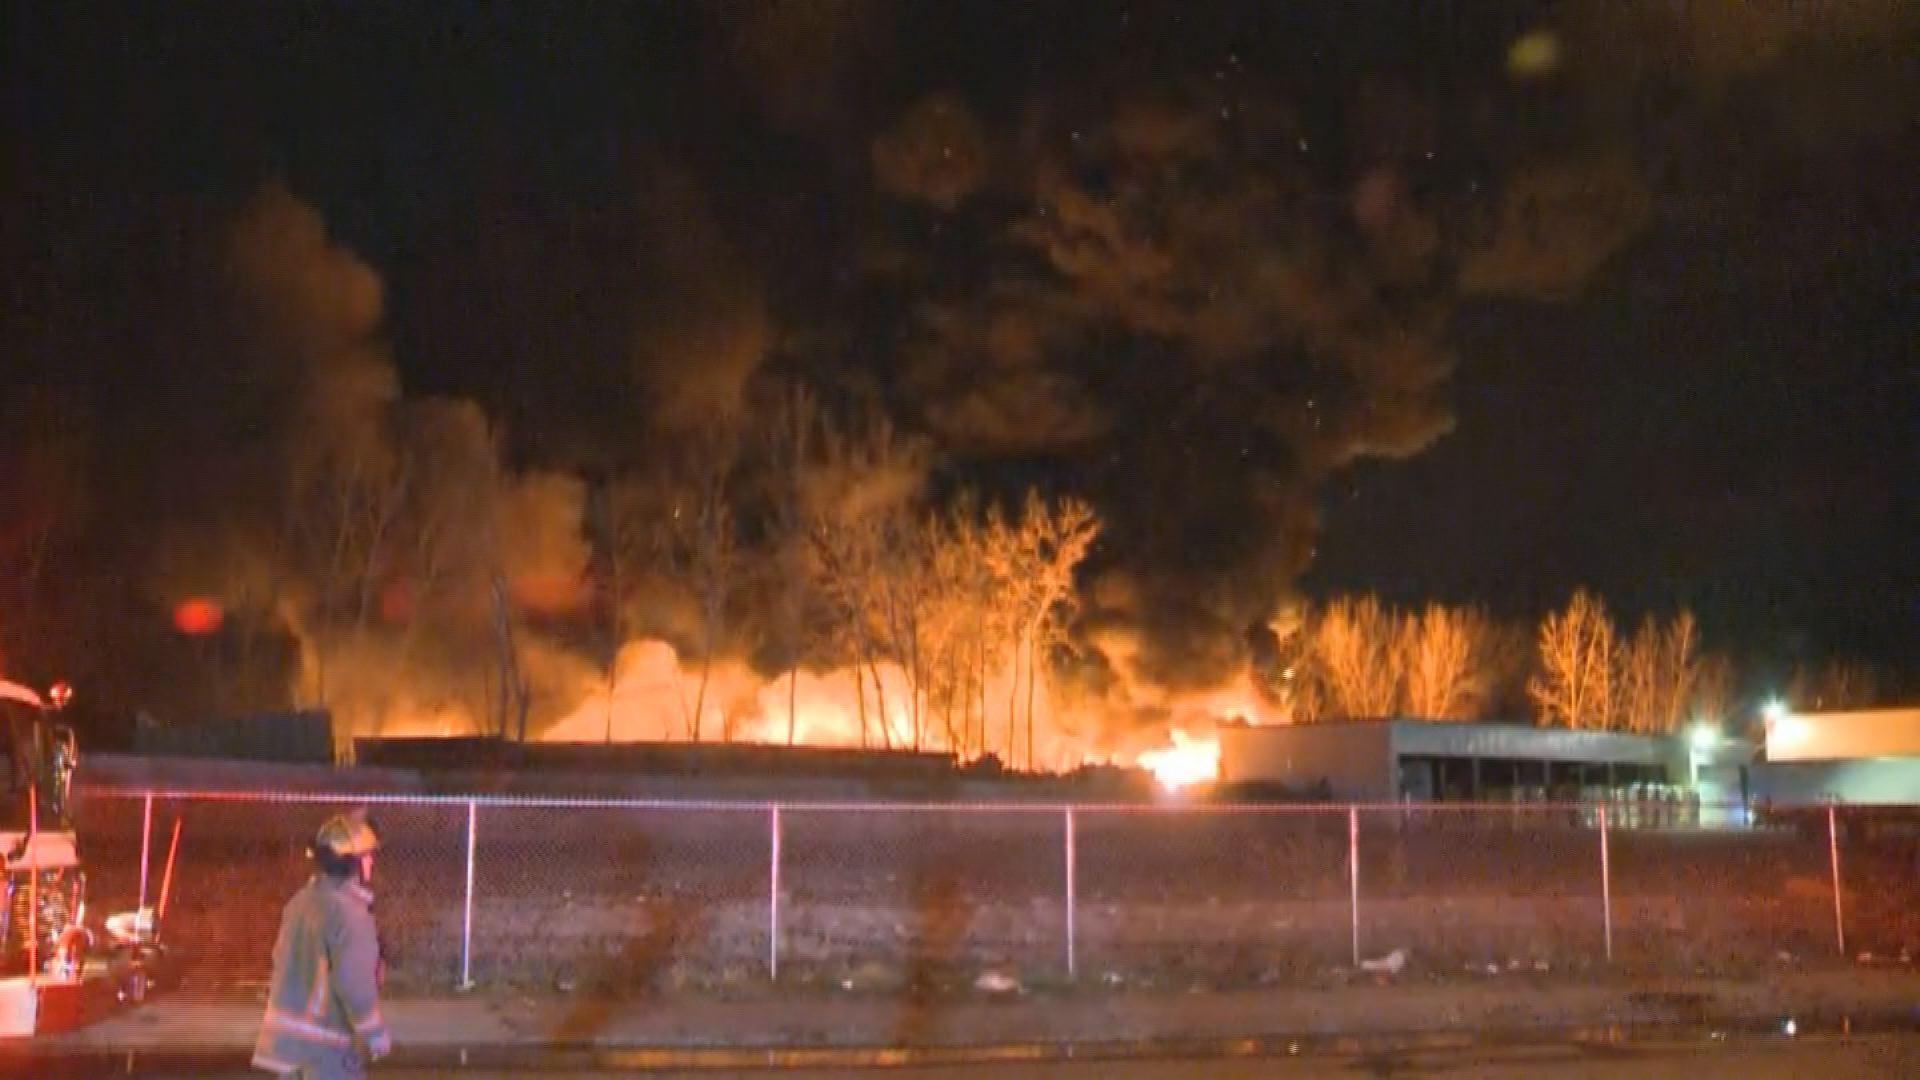 Large junkyard fire near chemical warehouse   WGRZ.com